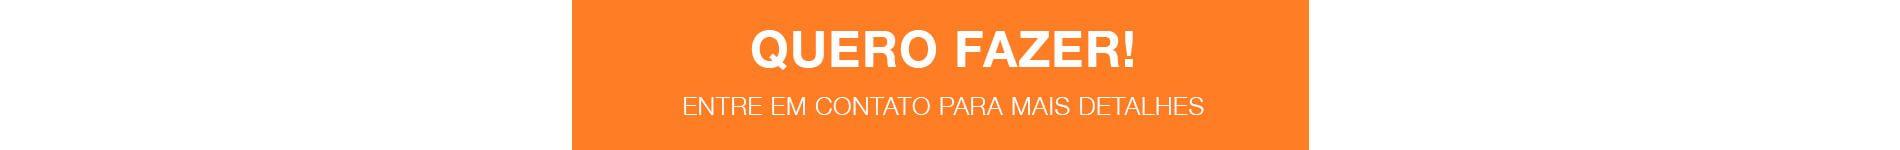 https://www.mestregp.com.br/wp-content/uploads/2018/01/botao_querofazer-1900x150.jpg